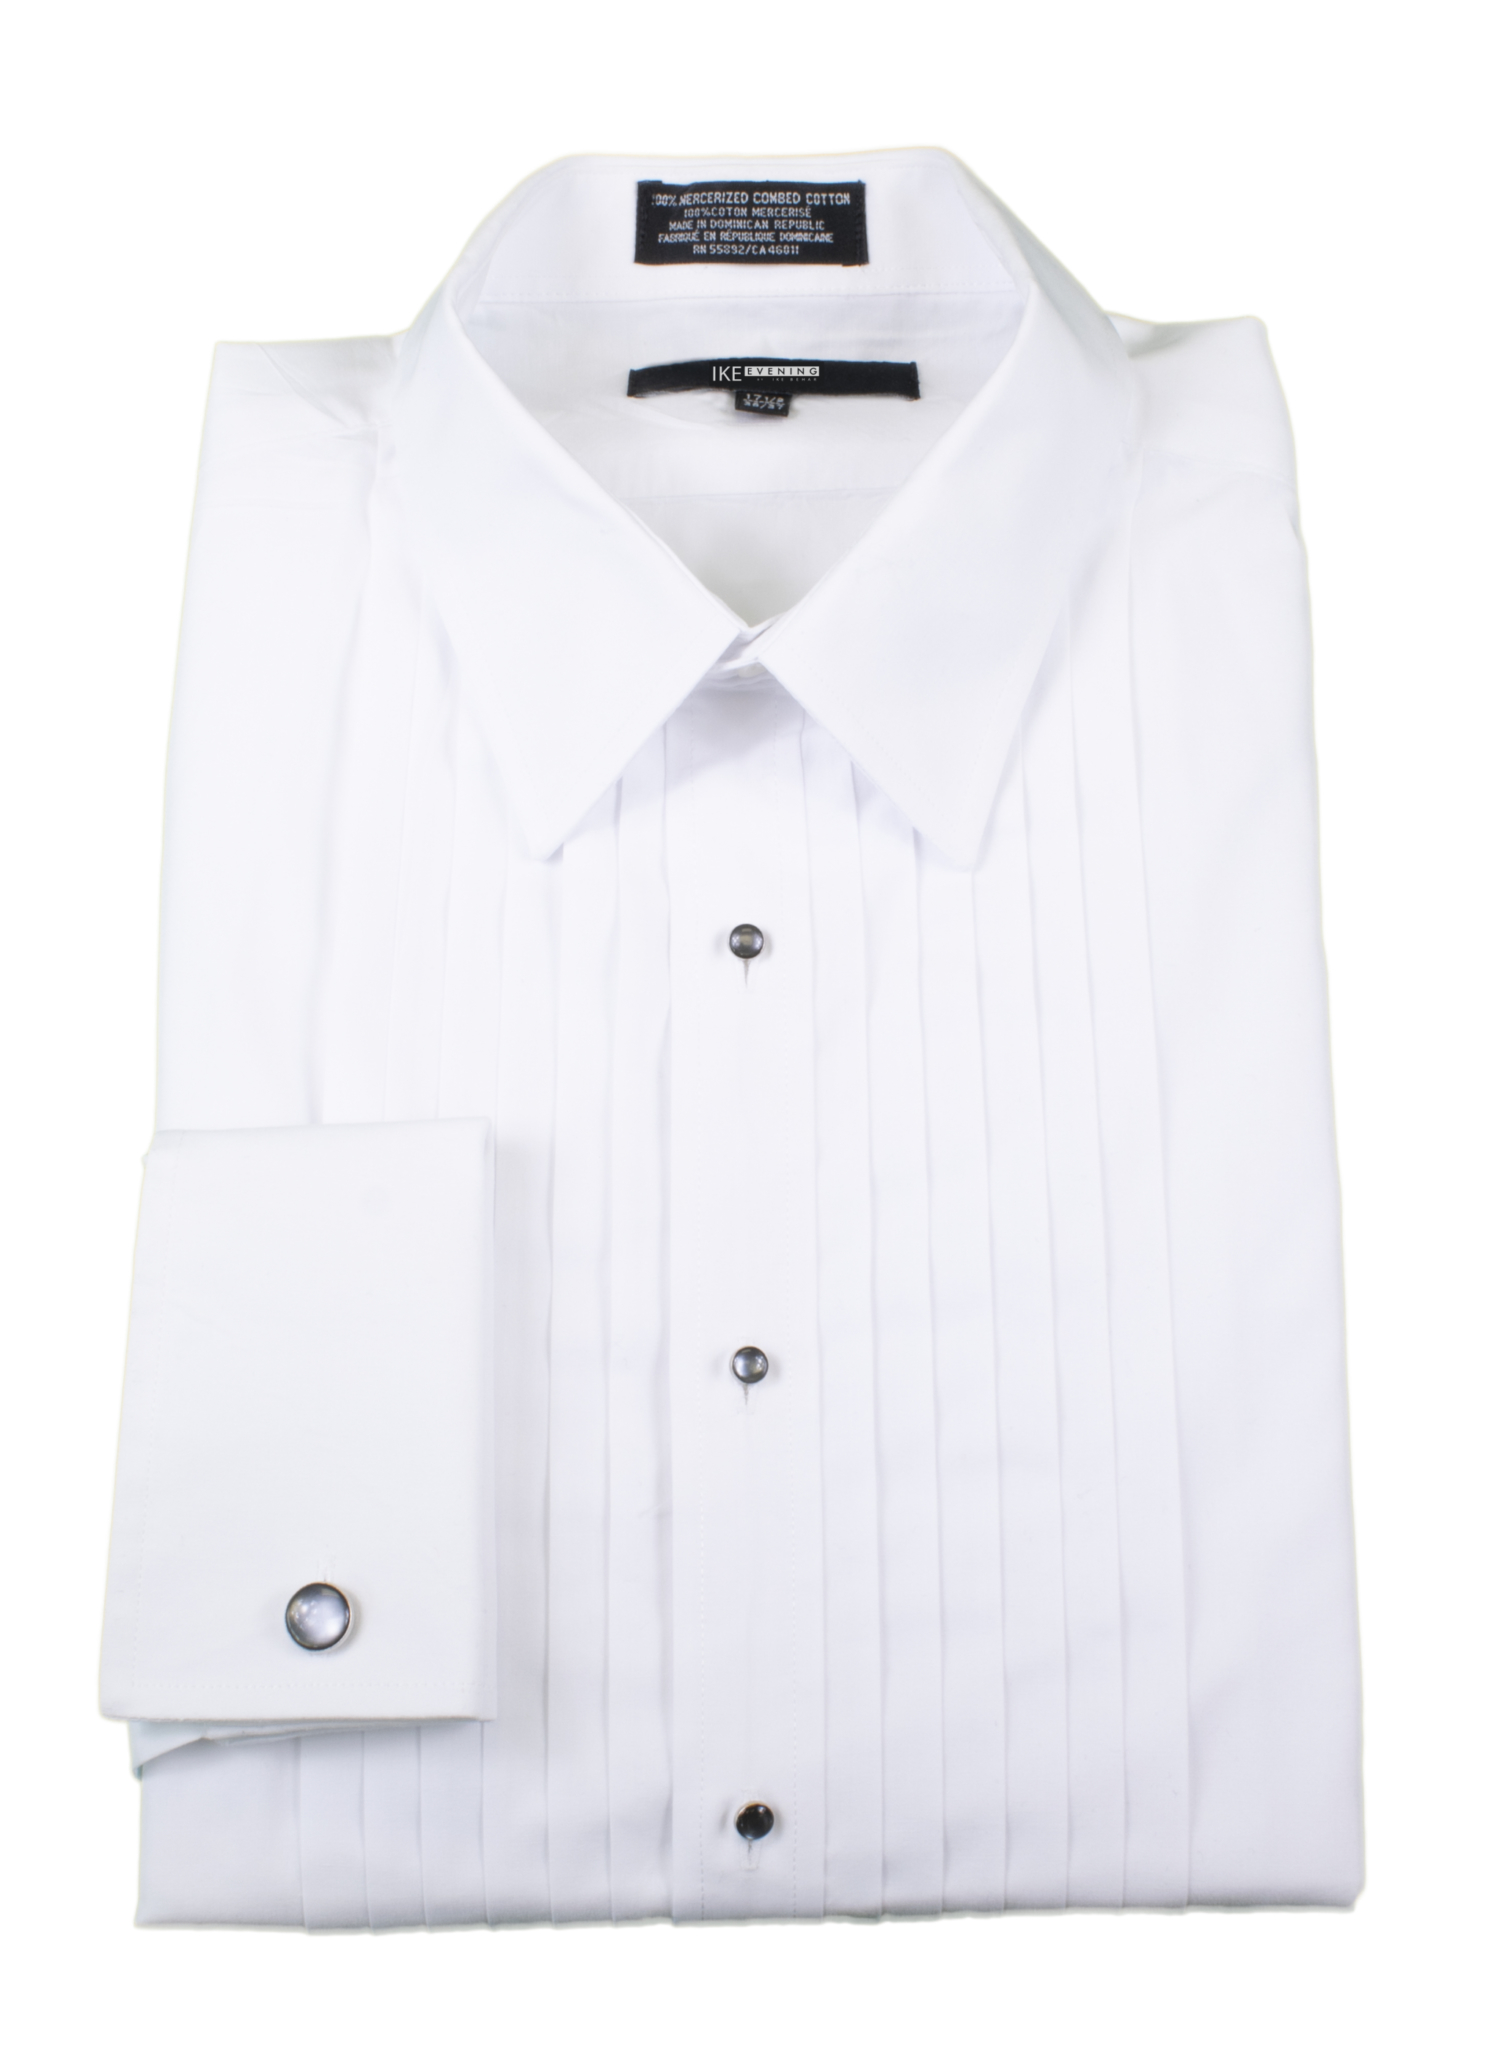 0c9a8b2f3 100% Cotton French Cuff Point Collar Shirt | Louie's Tux Shop